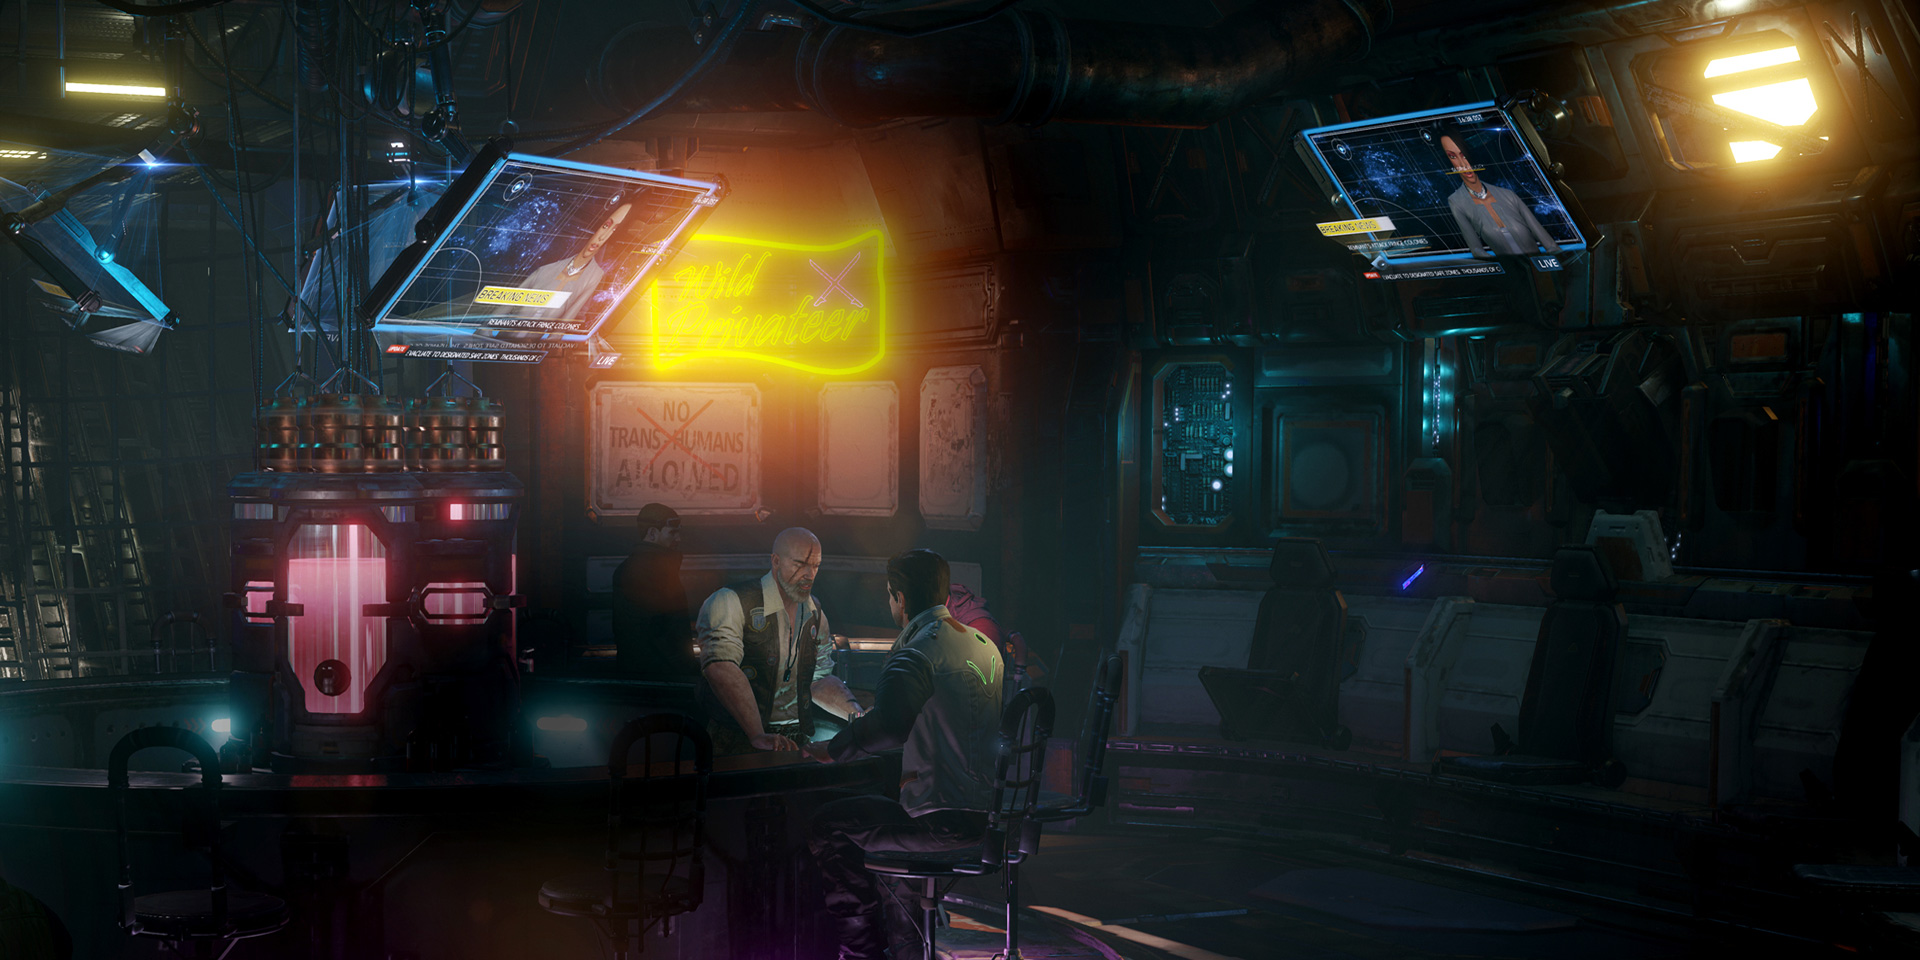 Dusty's Bar Lighting